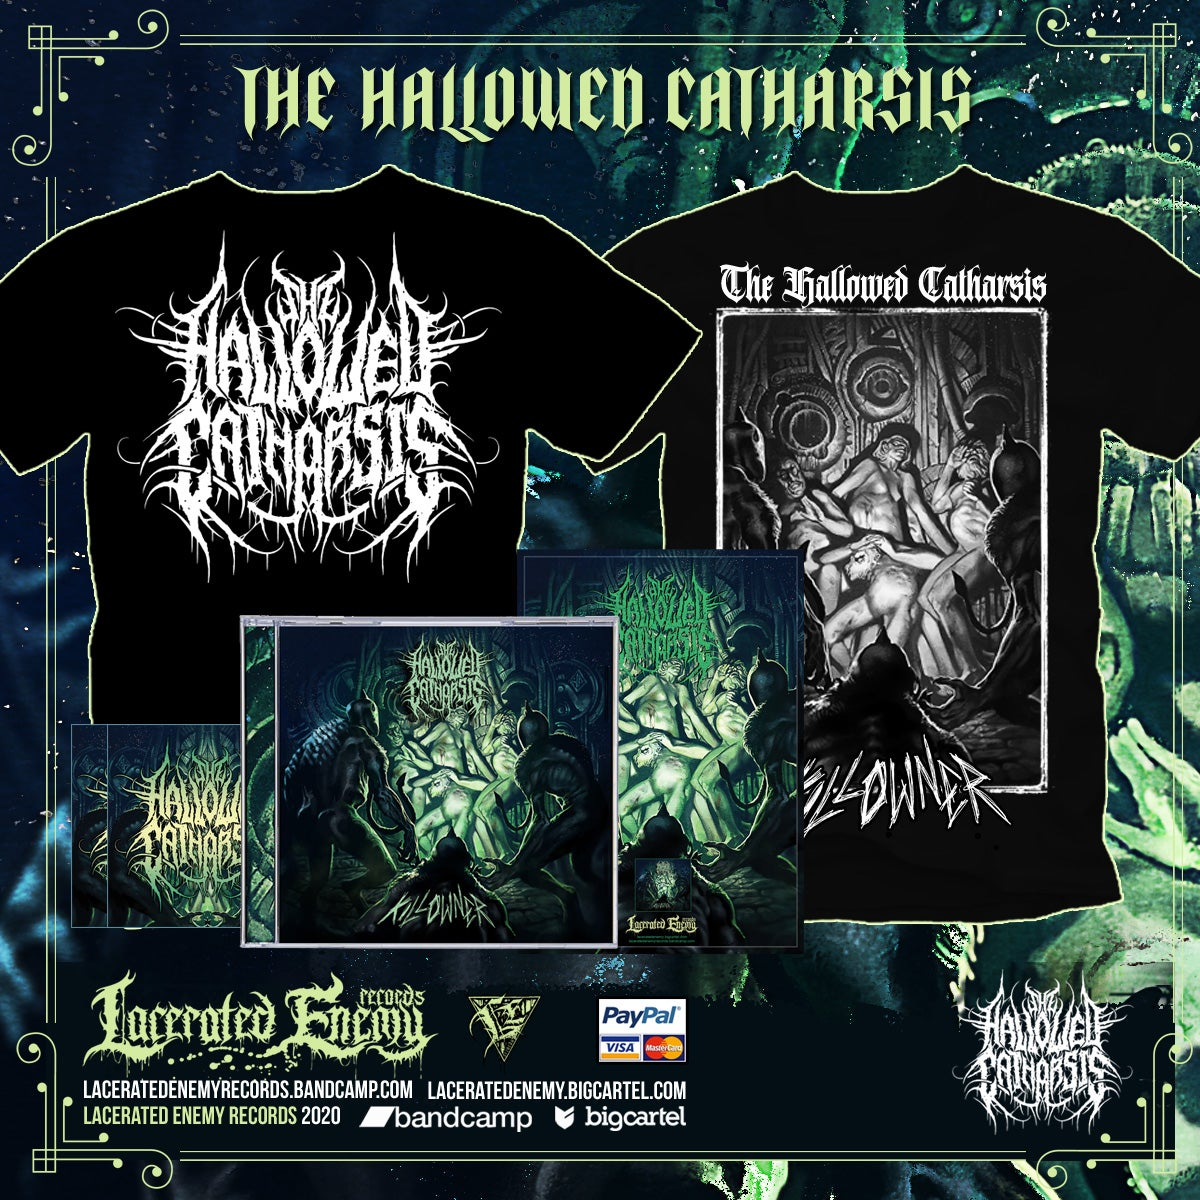 THE HALLOWED CATHARSIS - Killowner - Thsirt Bundle